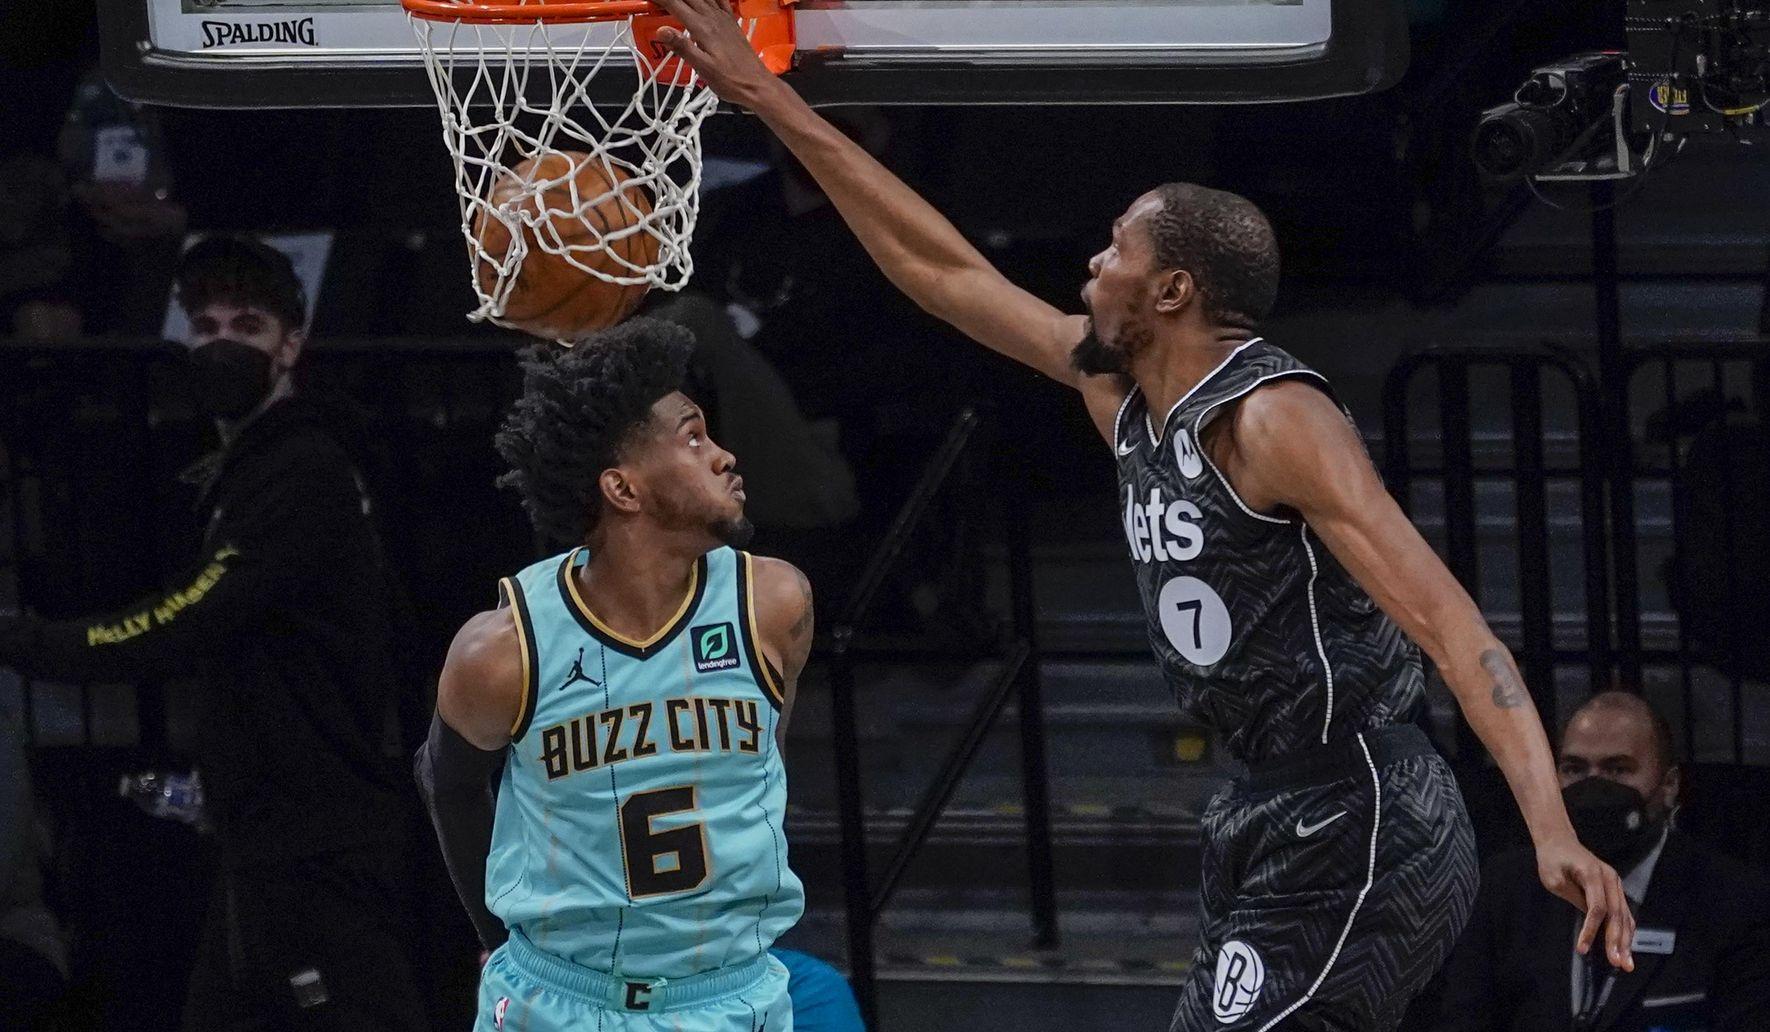 Hornets_nets_basketball_51031_c0-127-3031-1894_s1770x1032